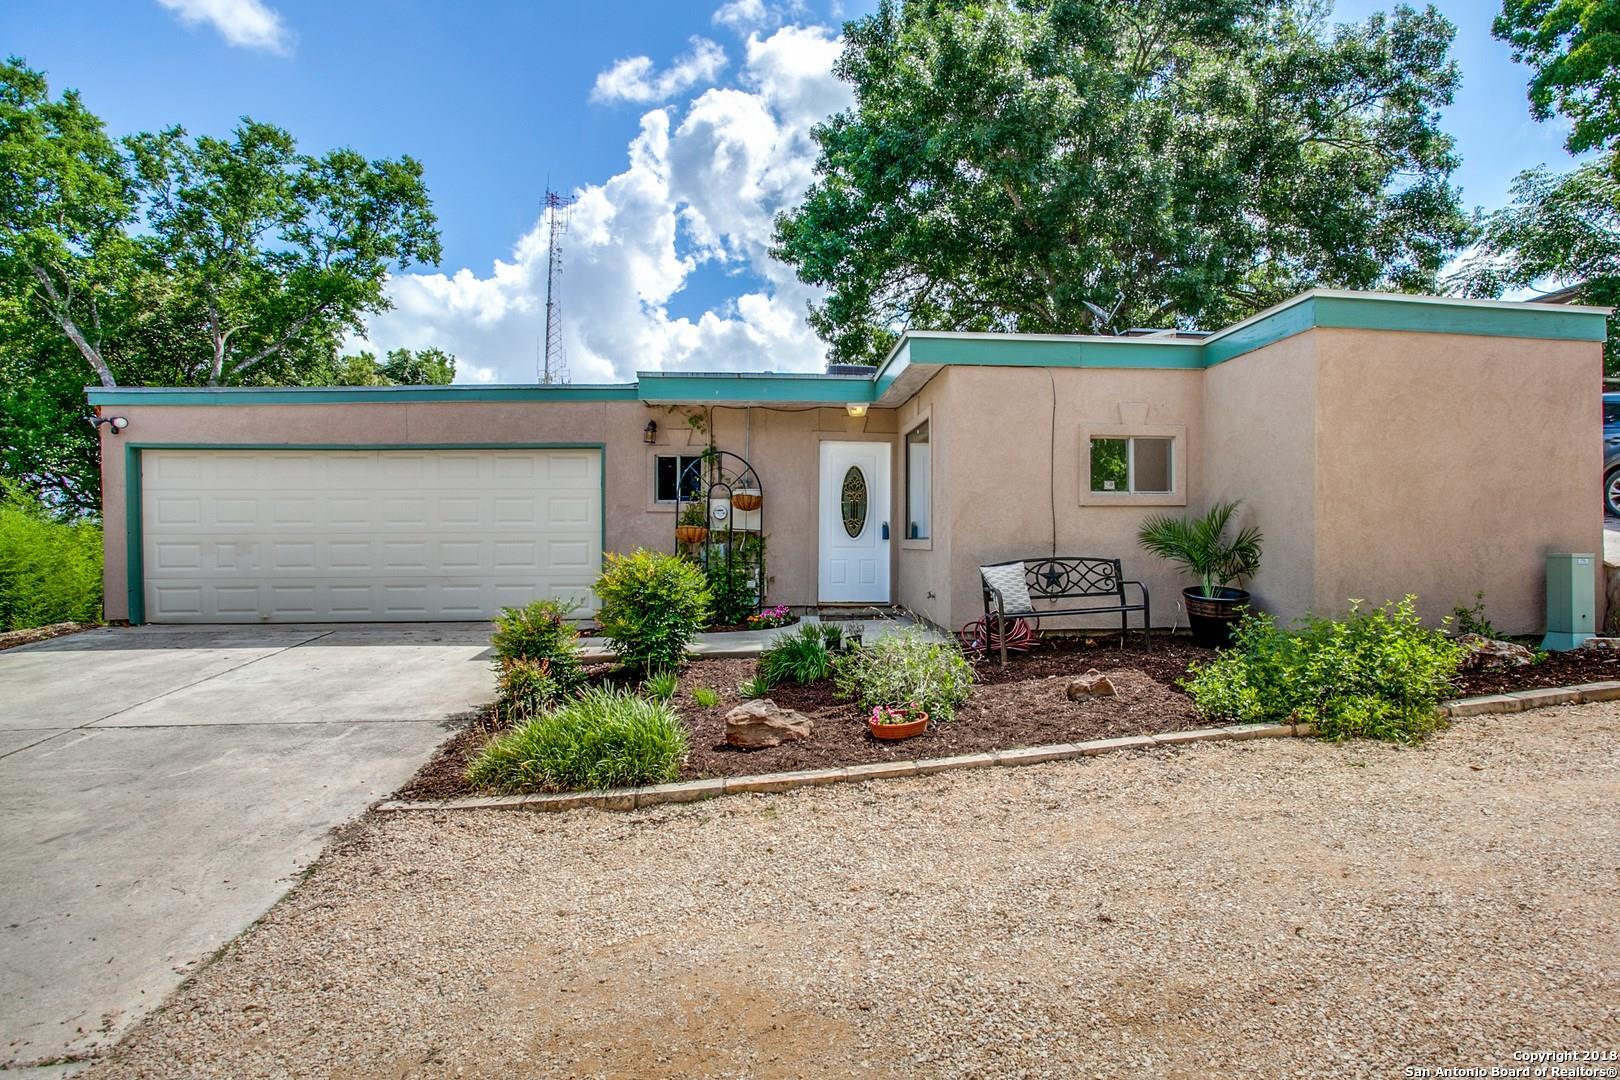 78233 Real Estate Listings Main Image